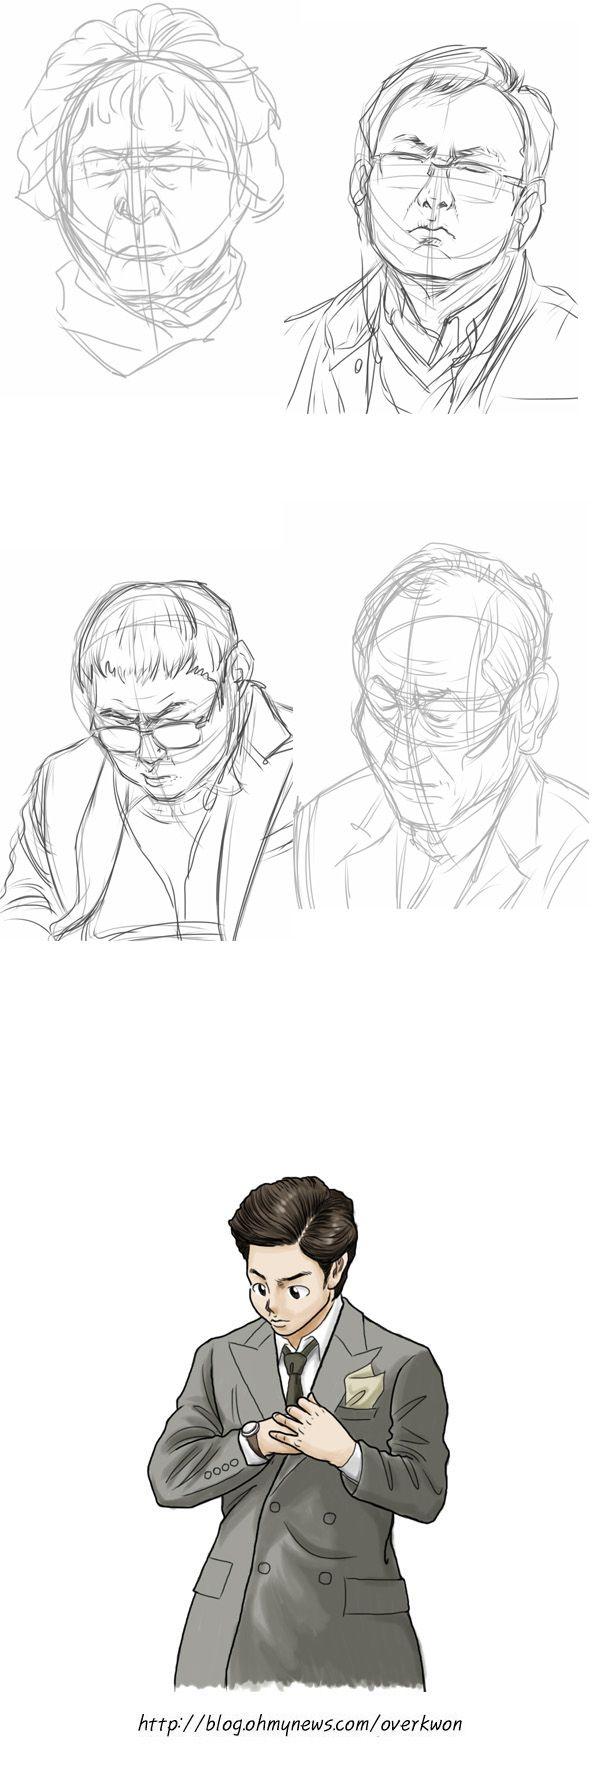 http://blog.ohmynews.com/overkwon/531133 오버권 아이패드 스케치 overkwon iPad sketch